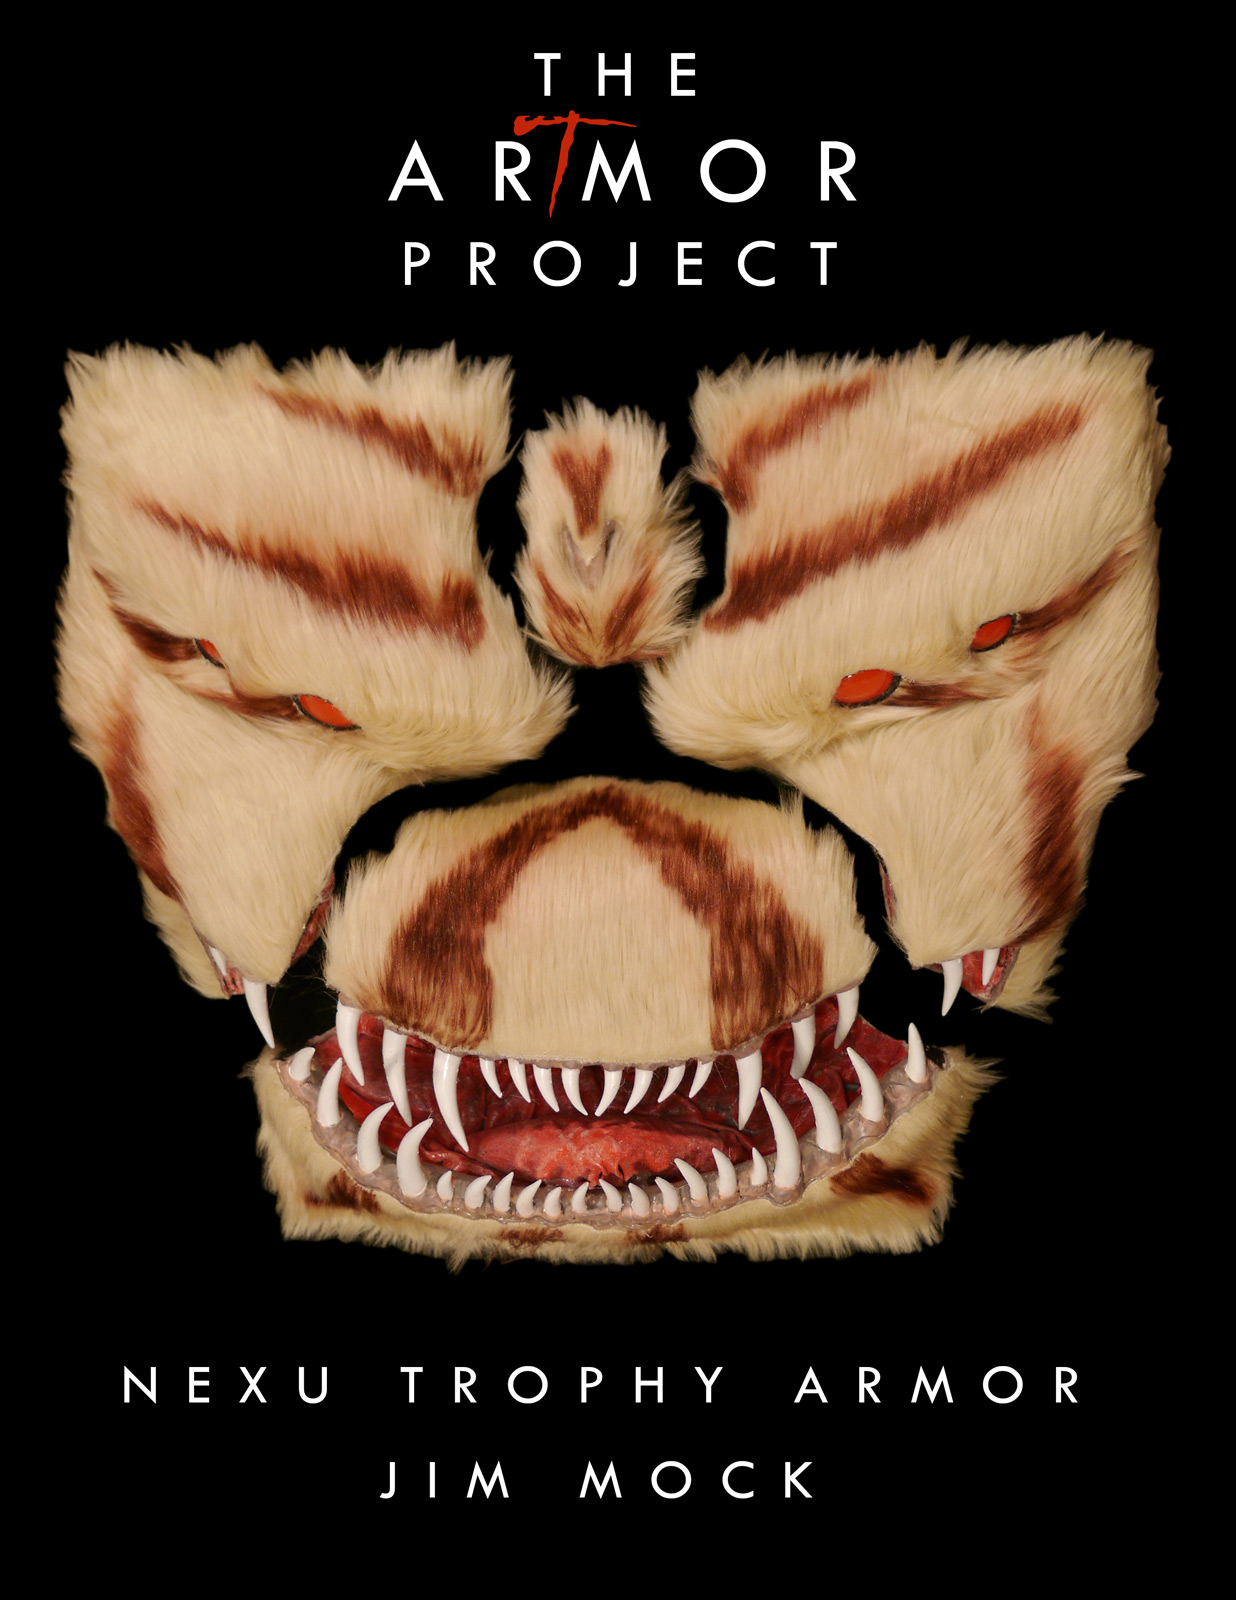 ArTmor 2015: Nexu Trophy Armor